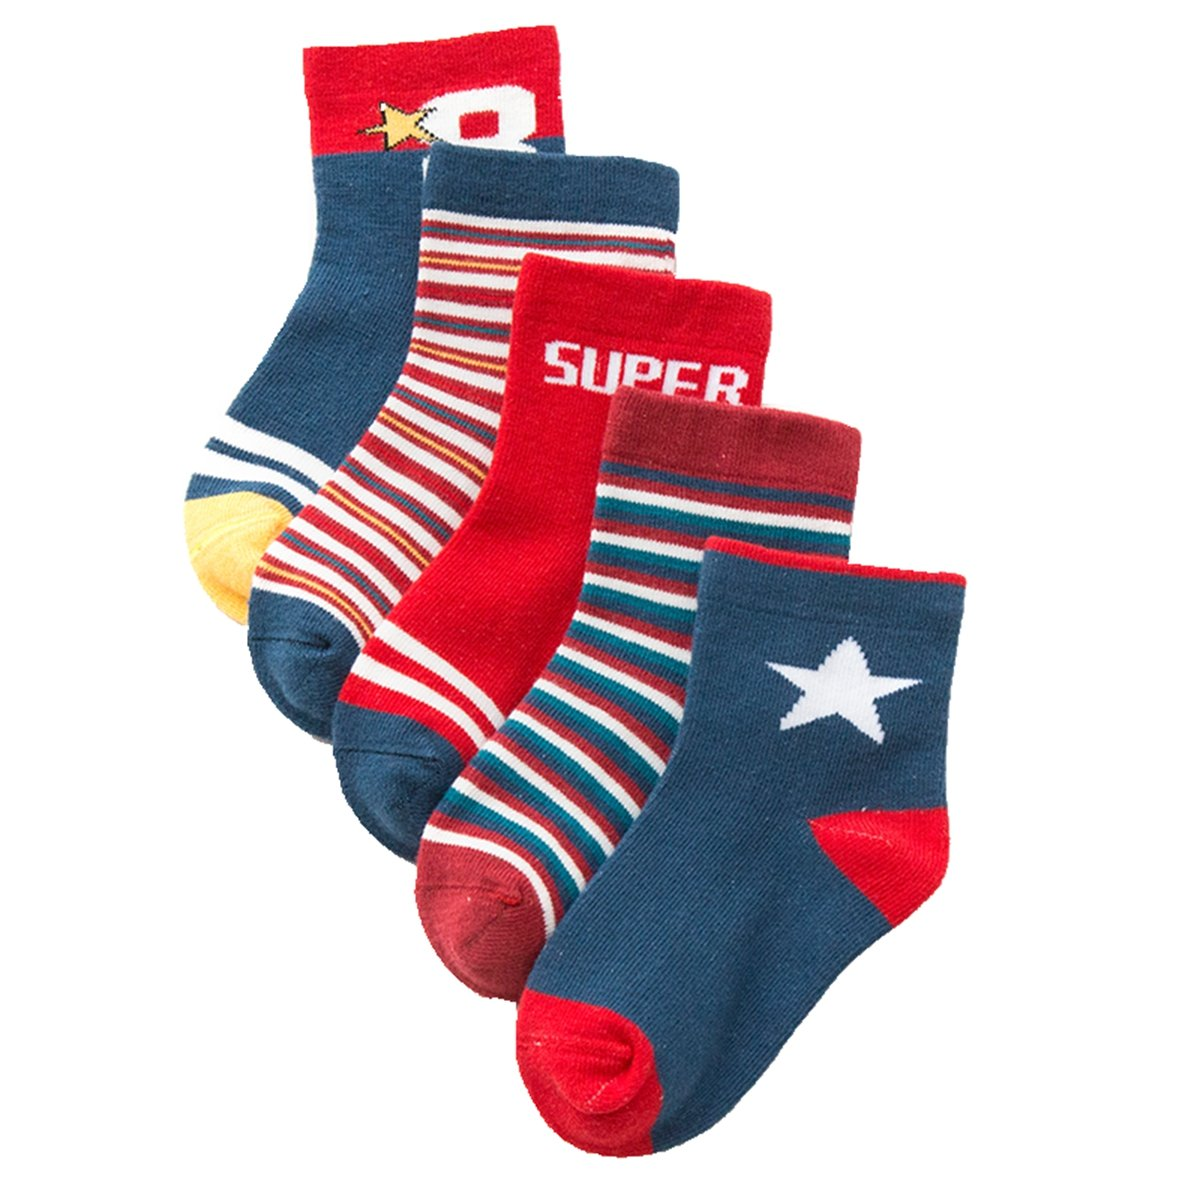 Little Boys Socks Cotton Stripe Comfort Crew Socks 5 Pair Pack Cczmfeas